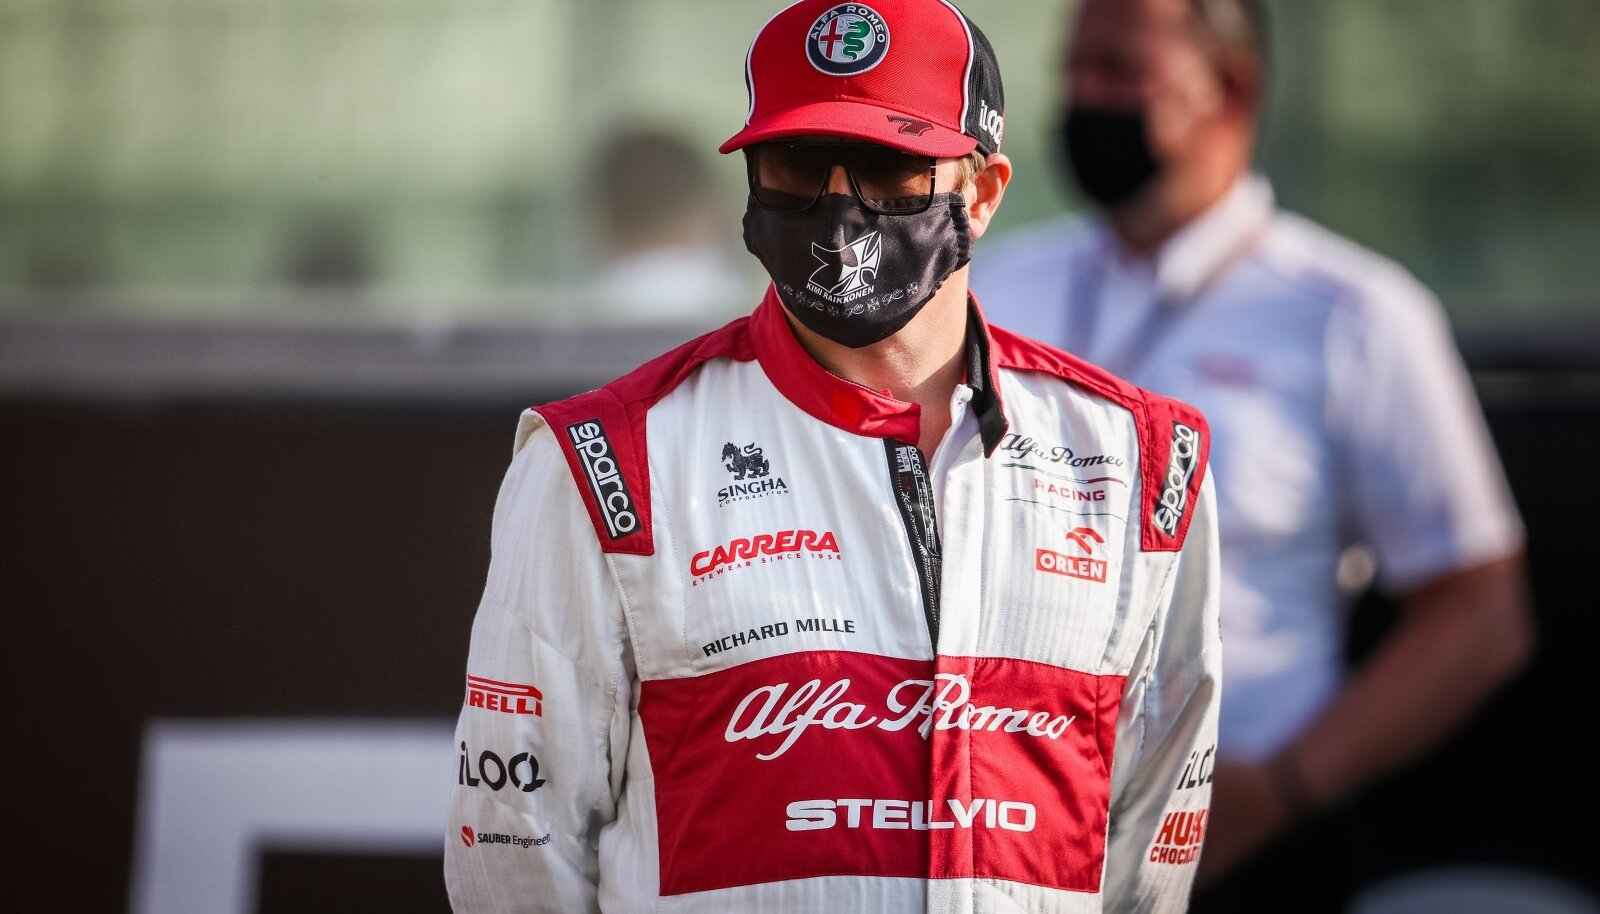 Motorsports: FIA Formula One World Championship 2020, Grand Prix of Abu Dhabi